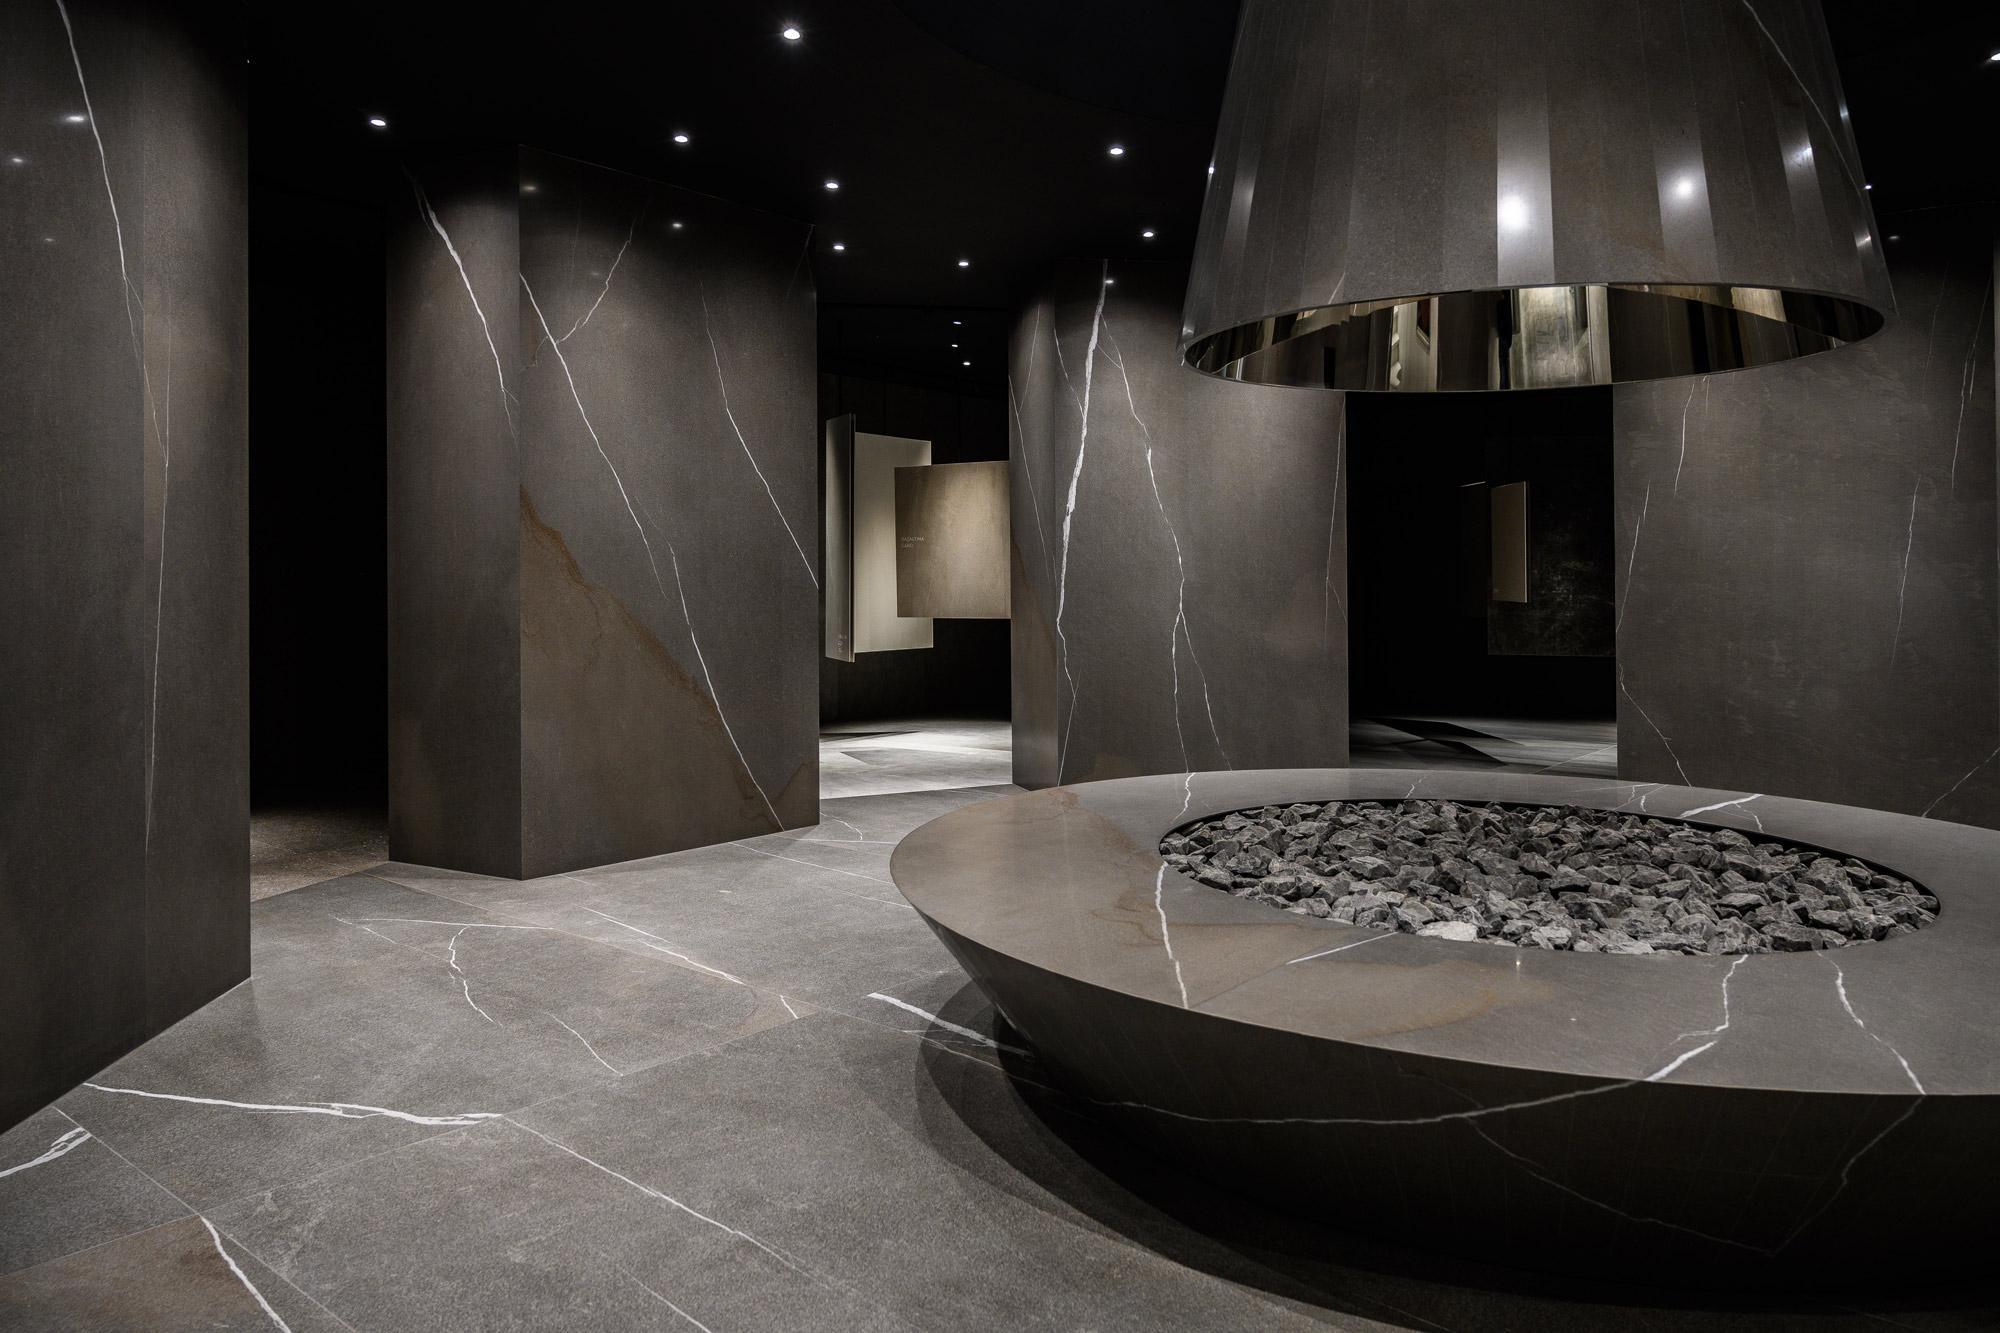 porcelain tile images: Royal Stone range high quality photo